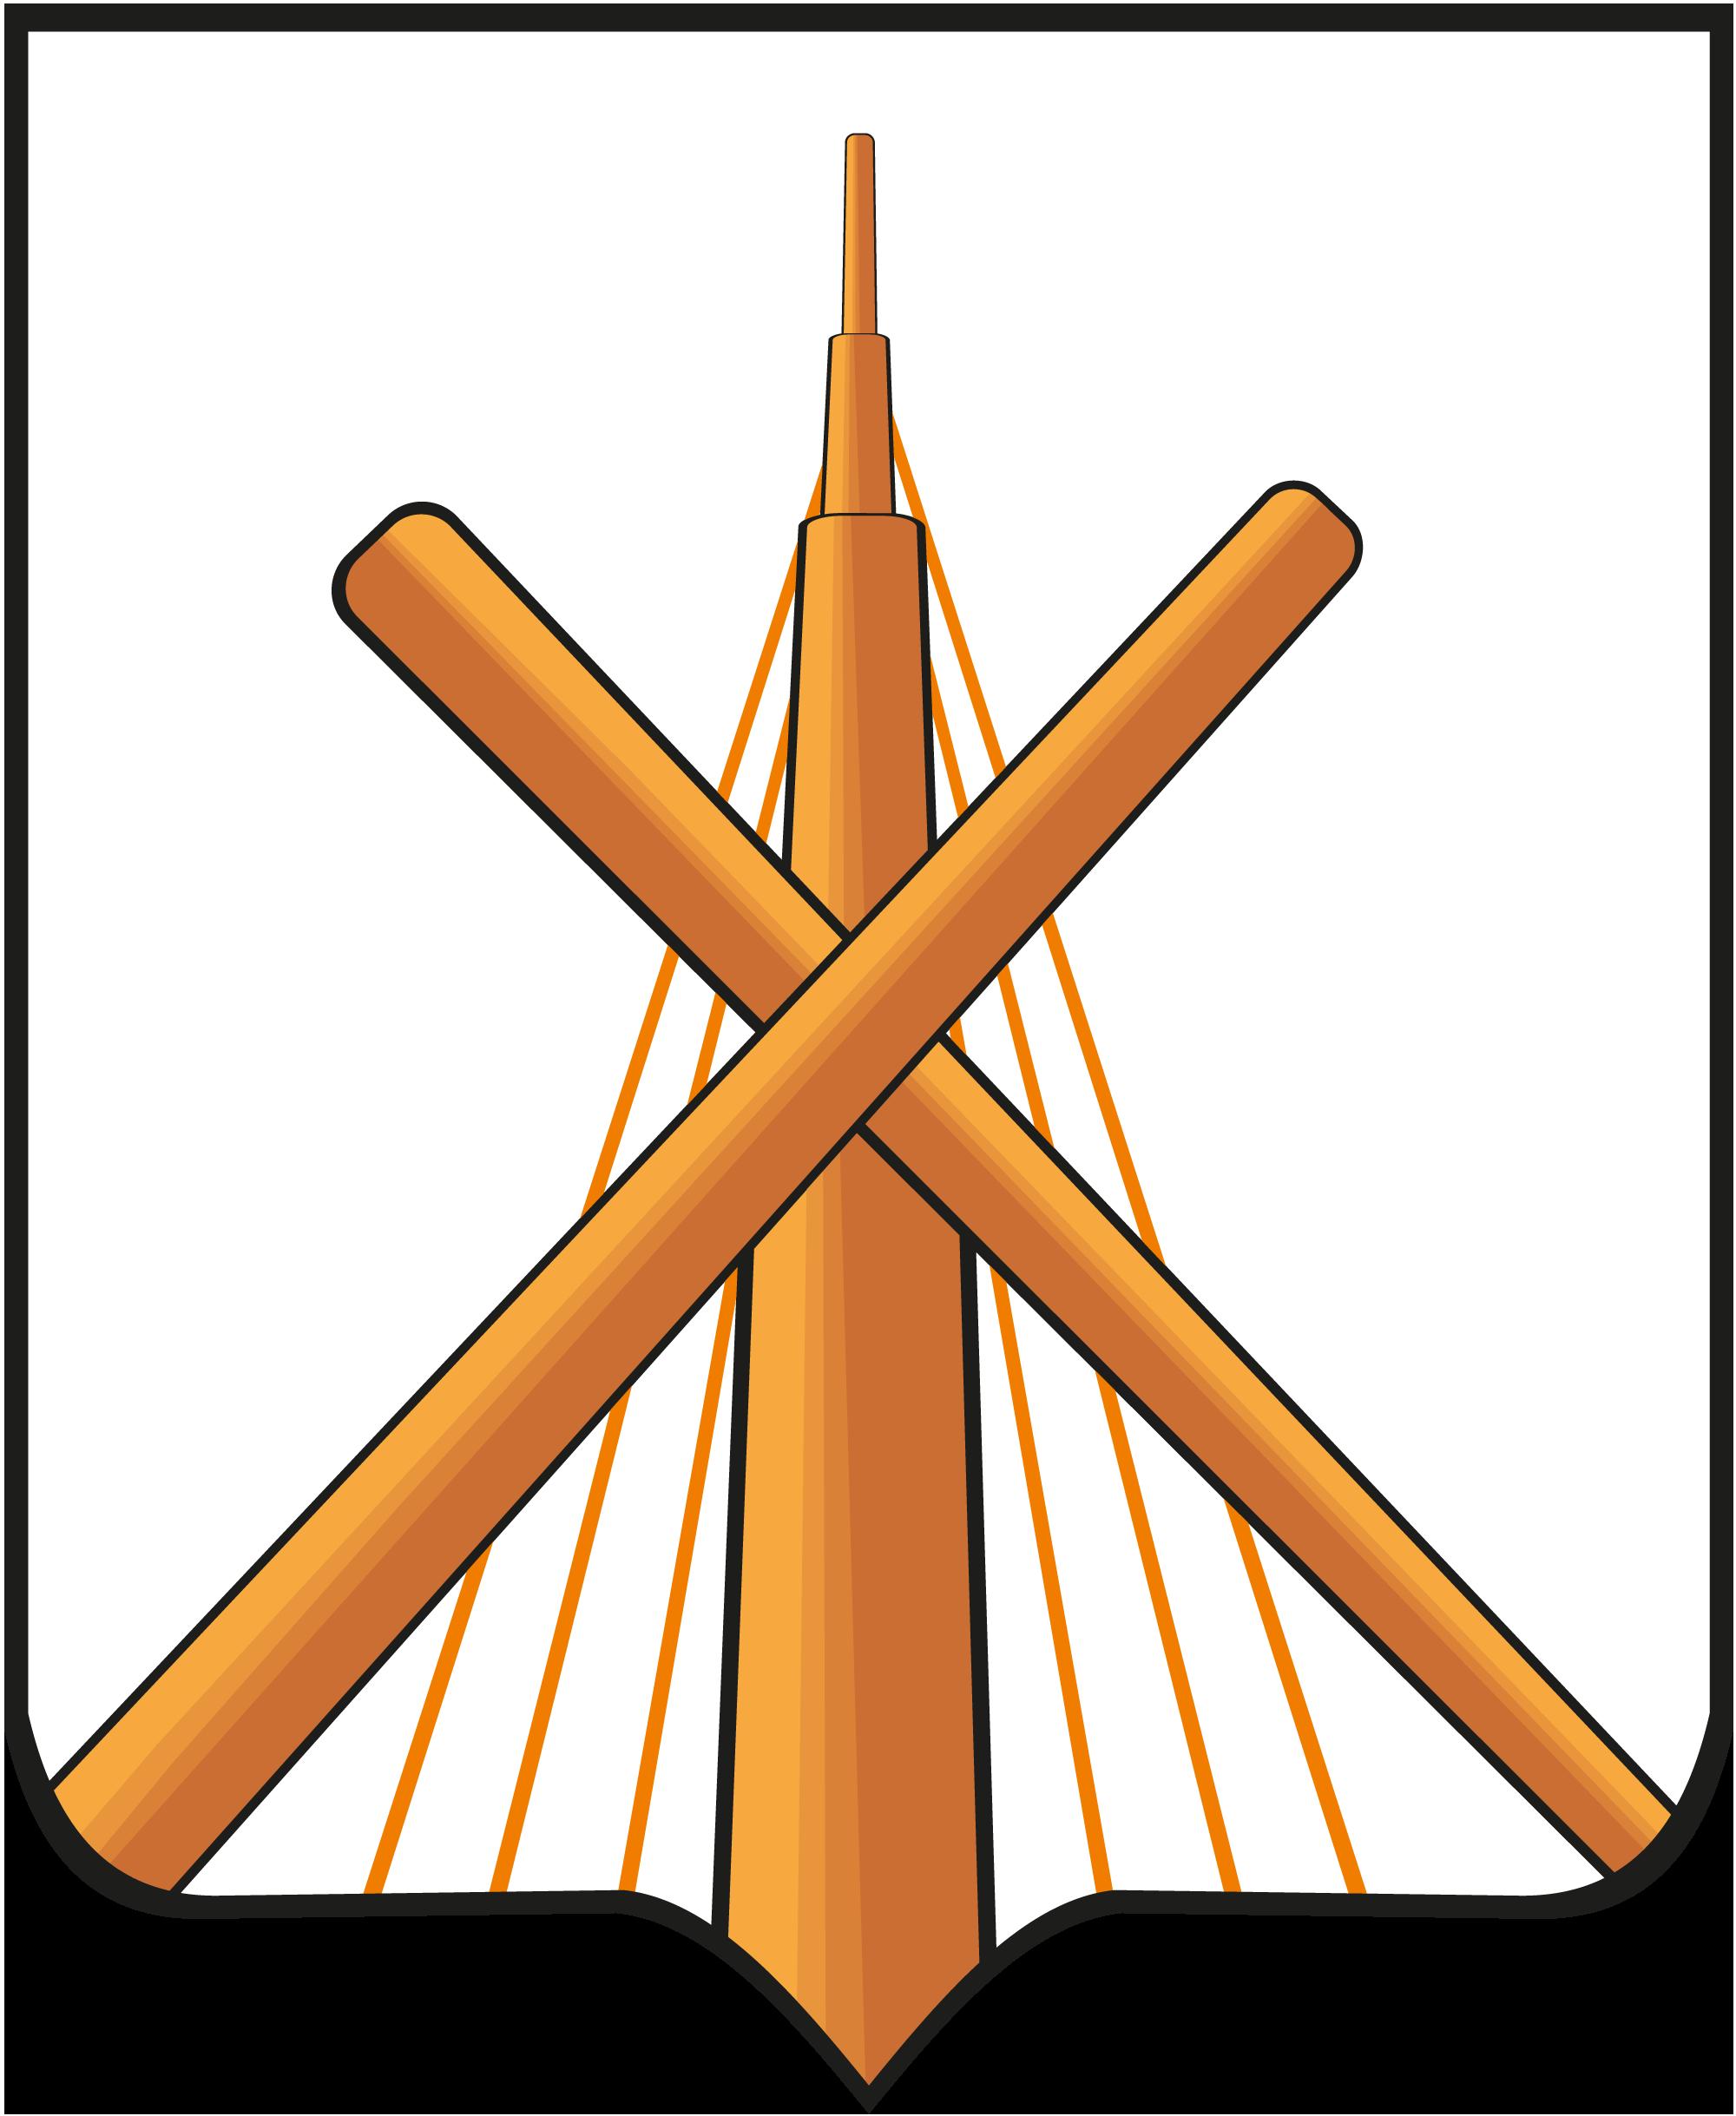 Герб города Бобруйск (Беларусь)